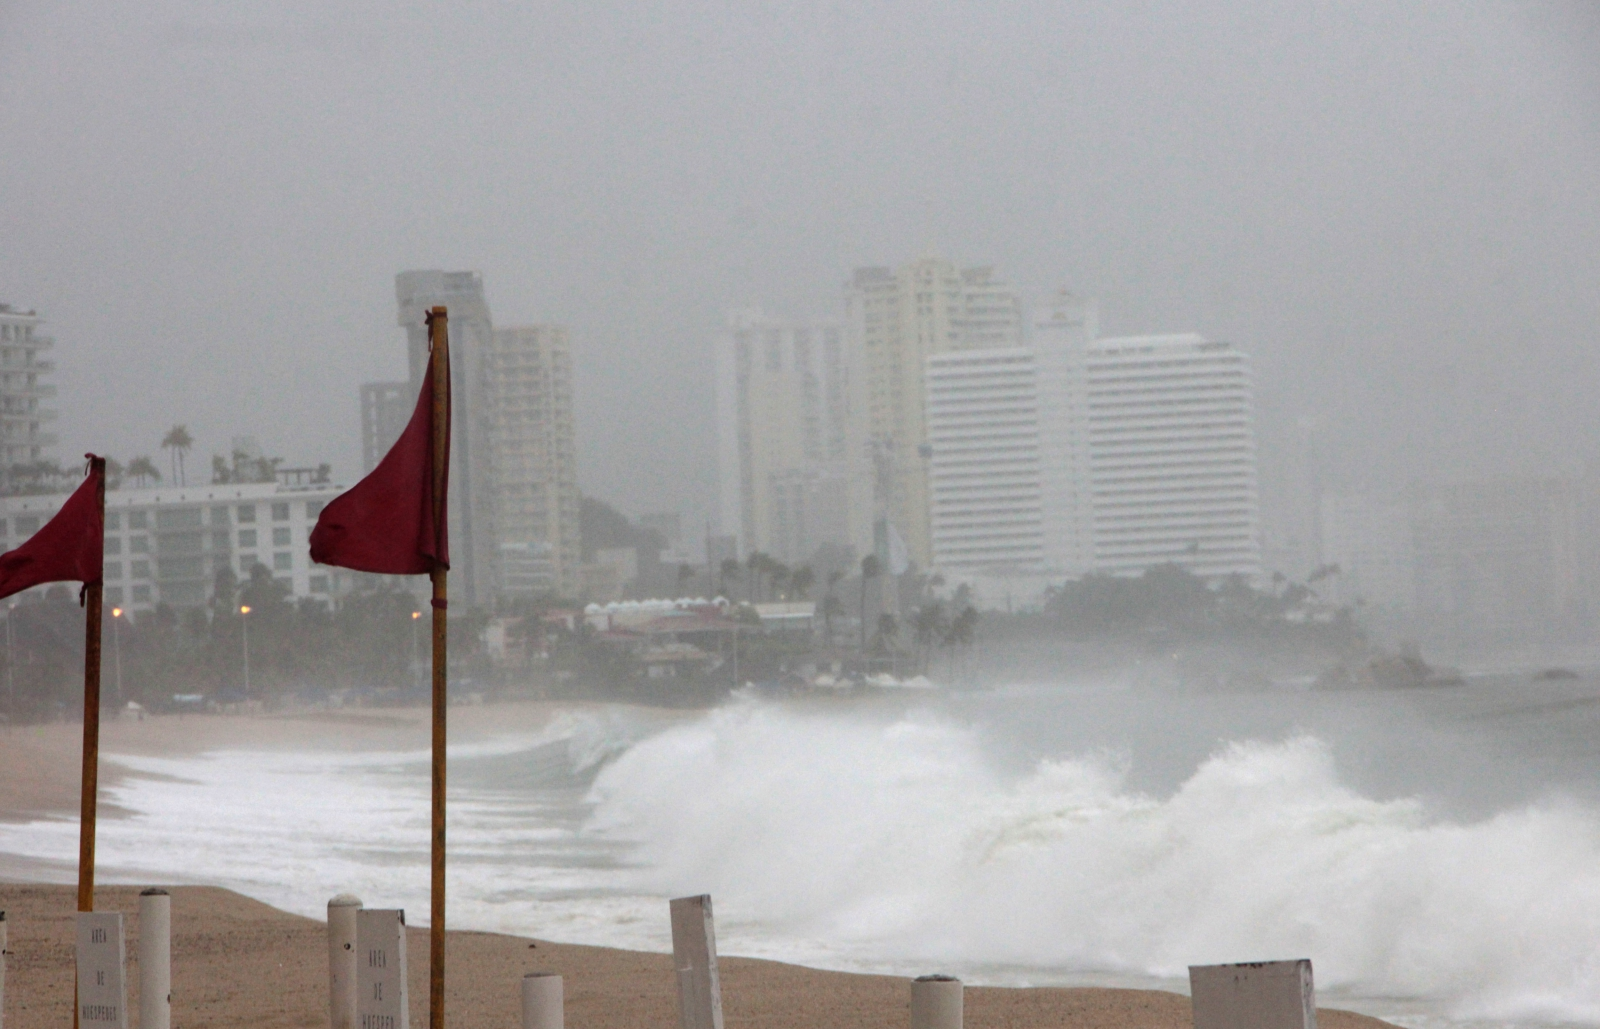 Meksyk, Hurragan na plaży w Aca Pulco EPA/Francisca Meza